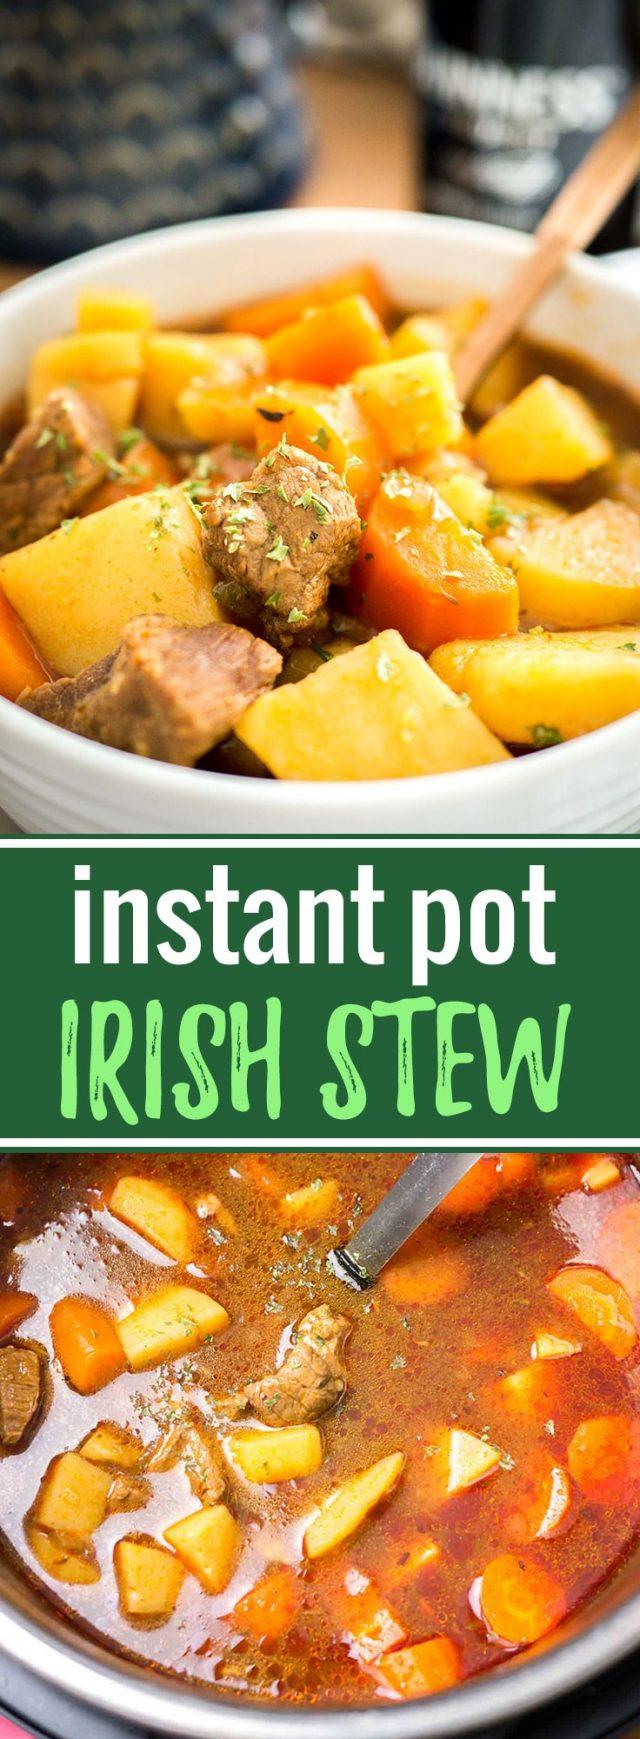 Instant Pot Irish Stew   Irish Beef Stew   Pressure Cooker Irish Stew   Beef Stew   Easy Stew Recipe   Tender Irish Stew   Beef and Guinness Stew